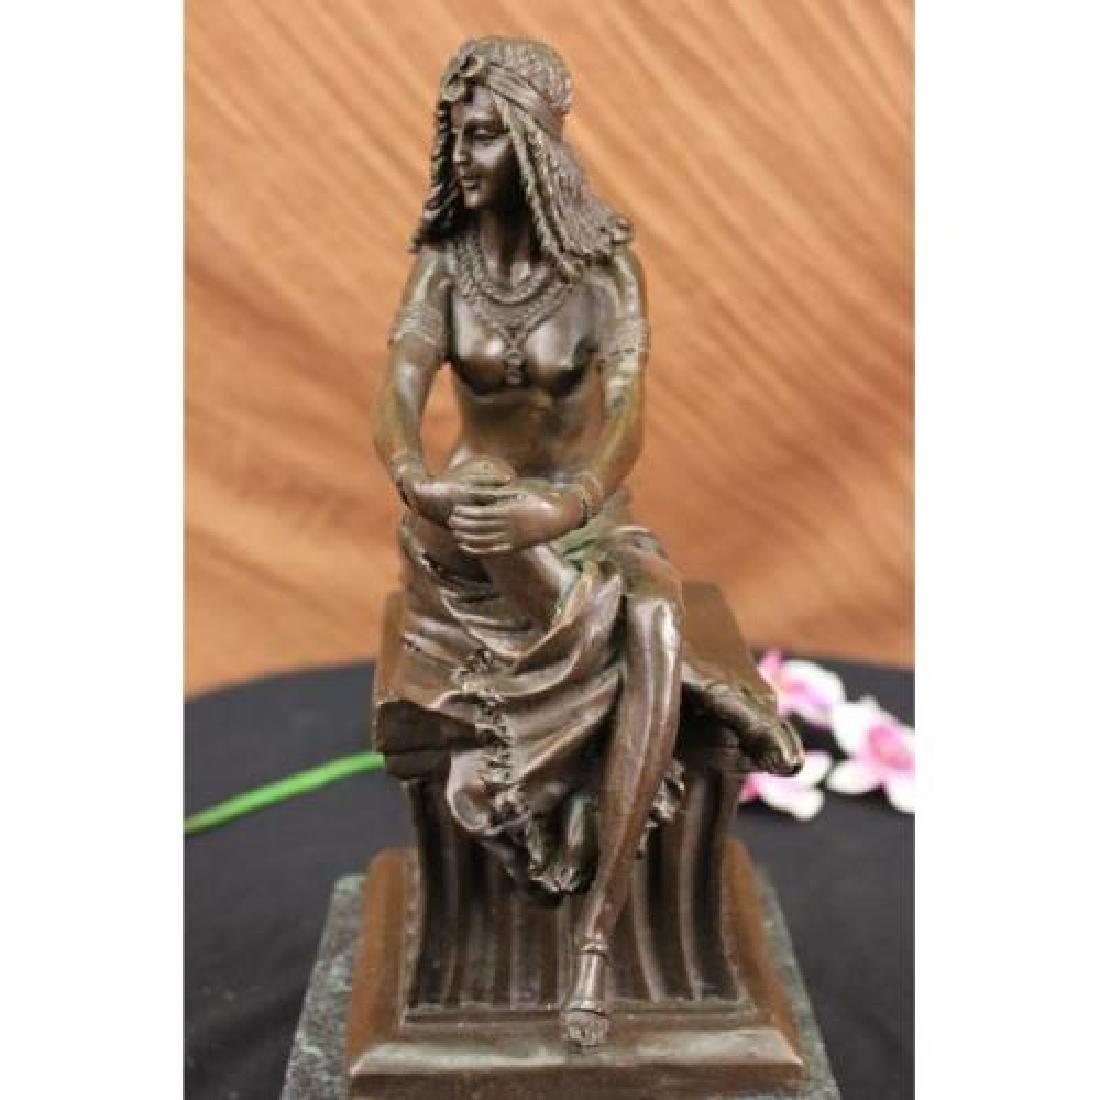 Sitting Egyptian Nude Princess Bronze Sculpture - 2